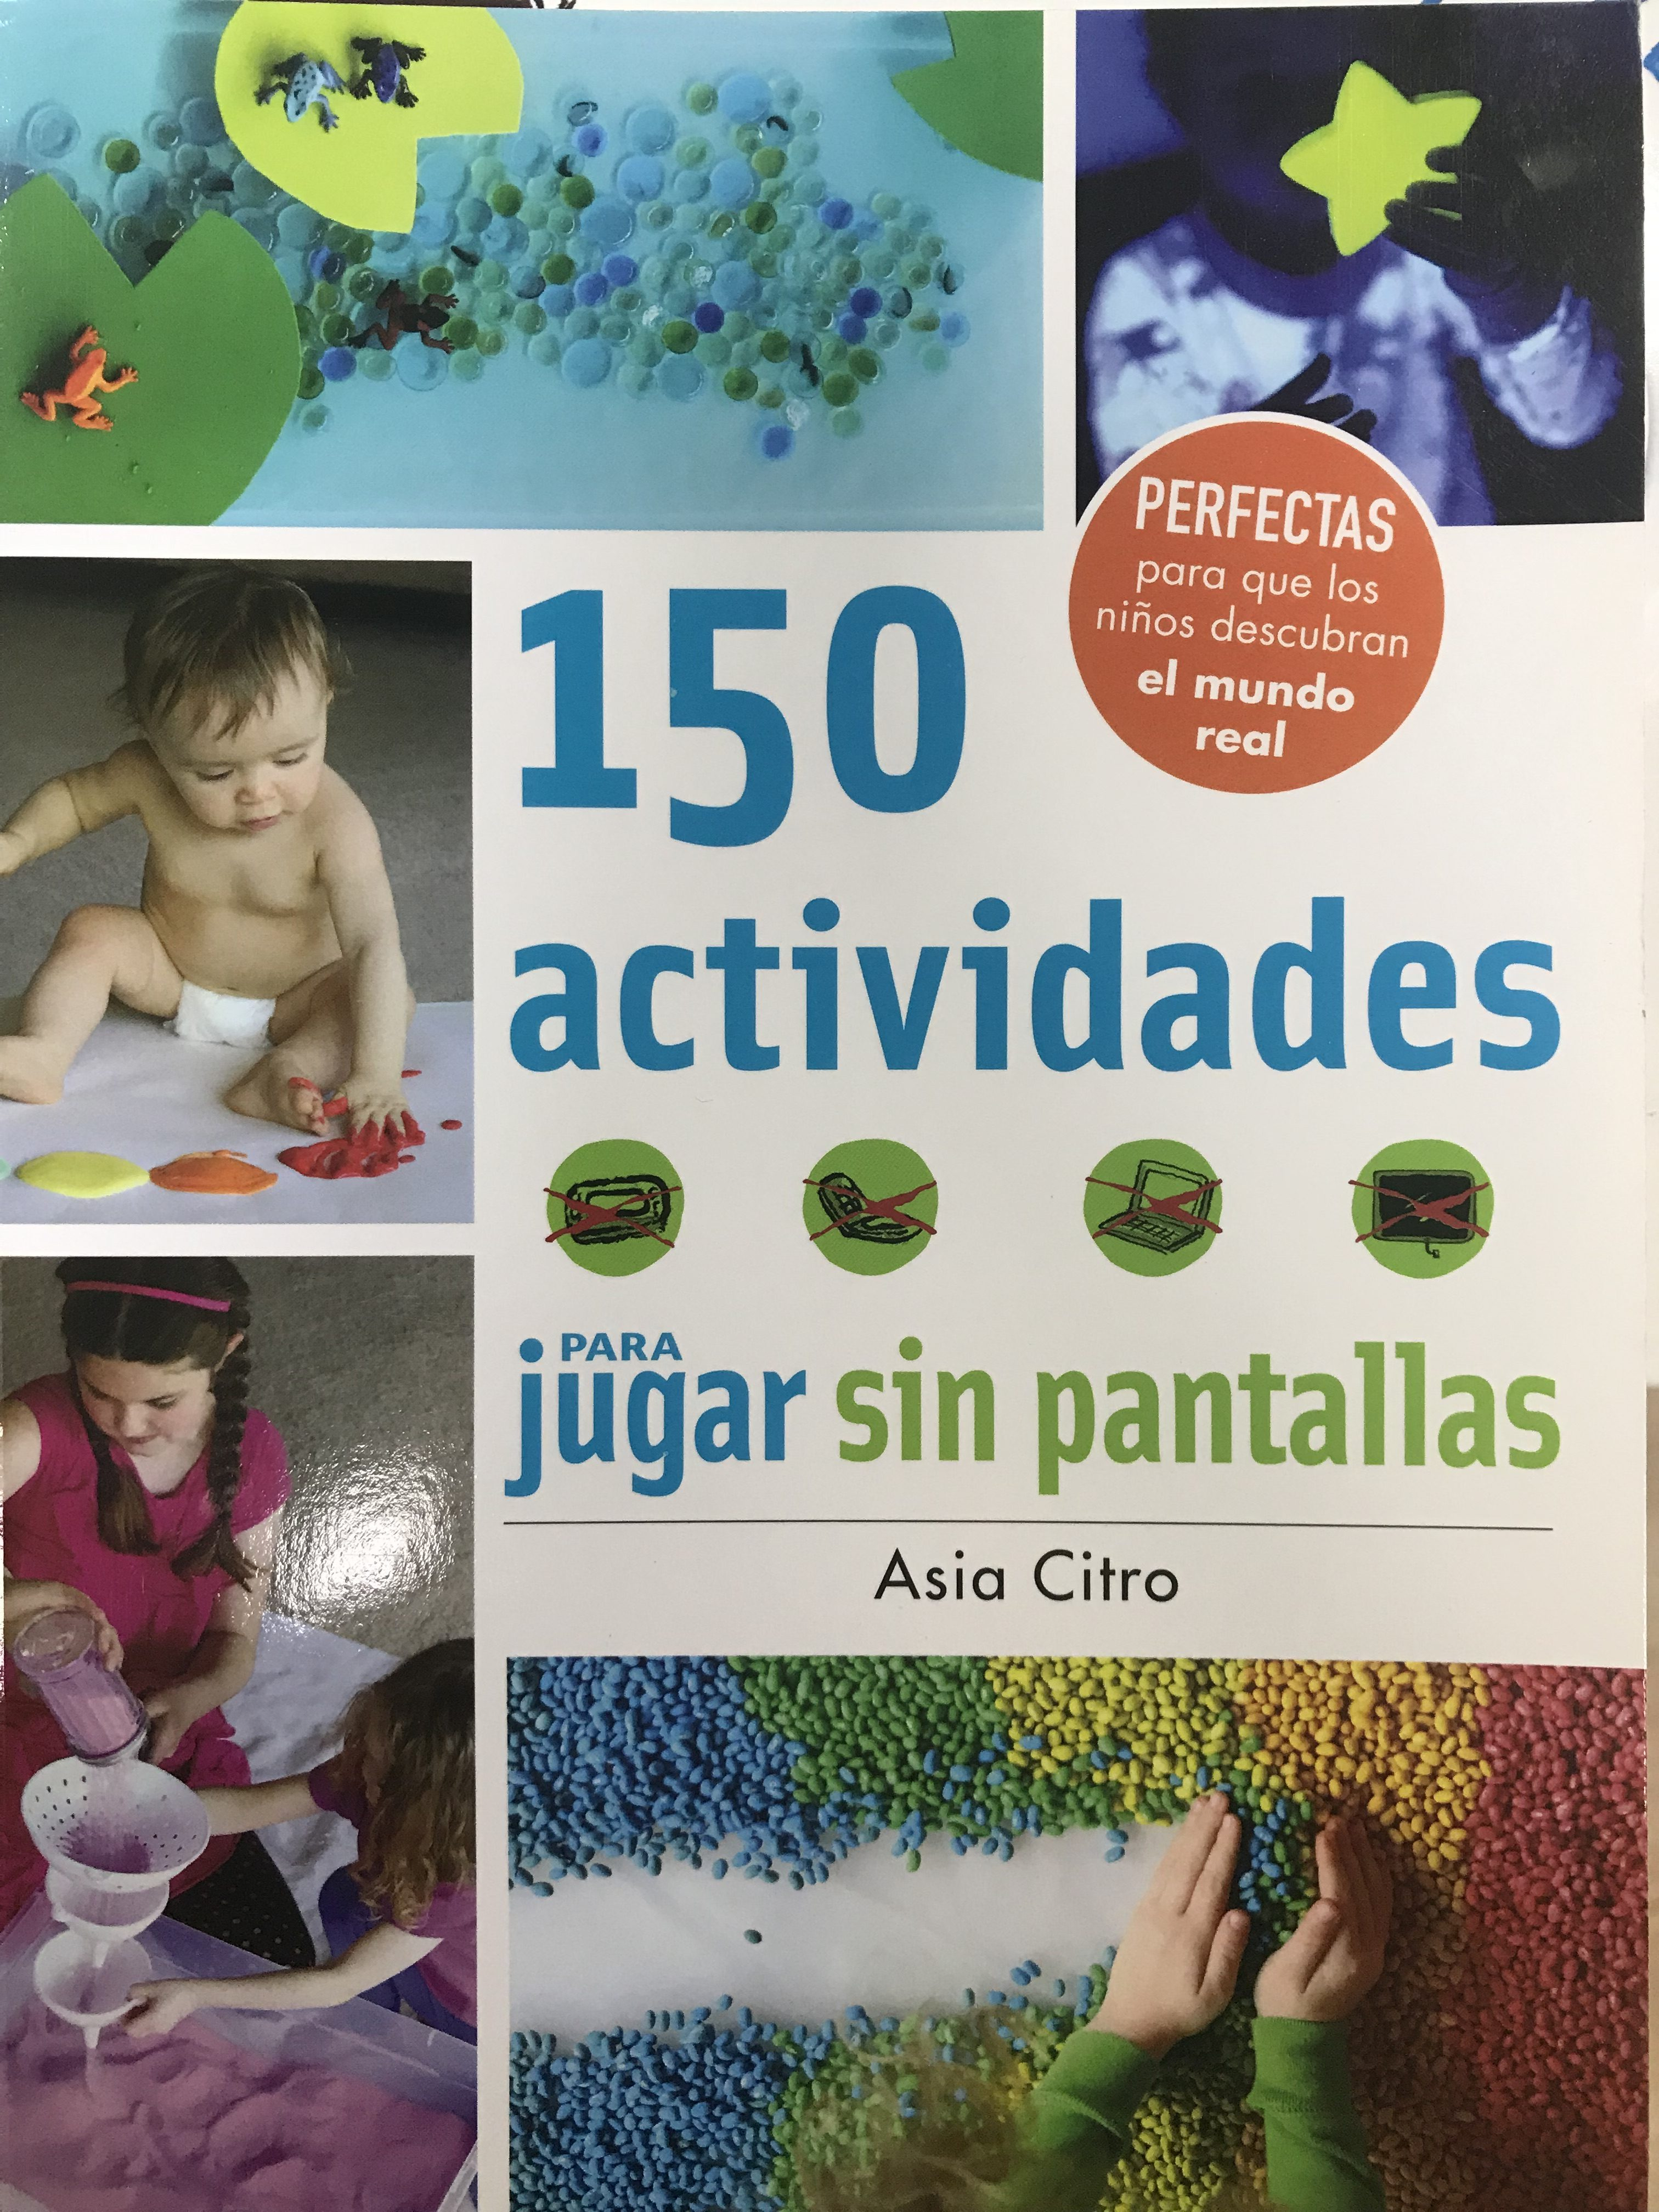 manualidades faciles para niños